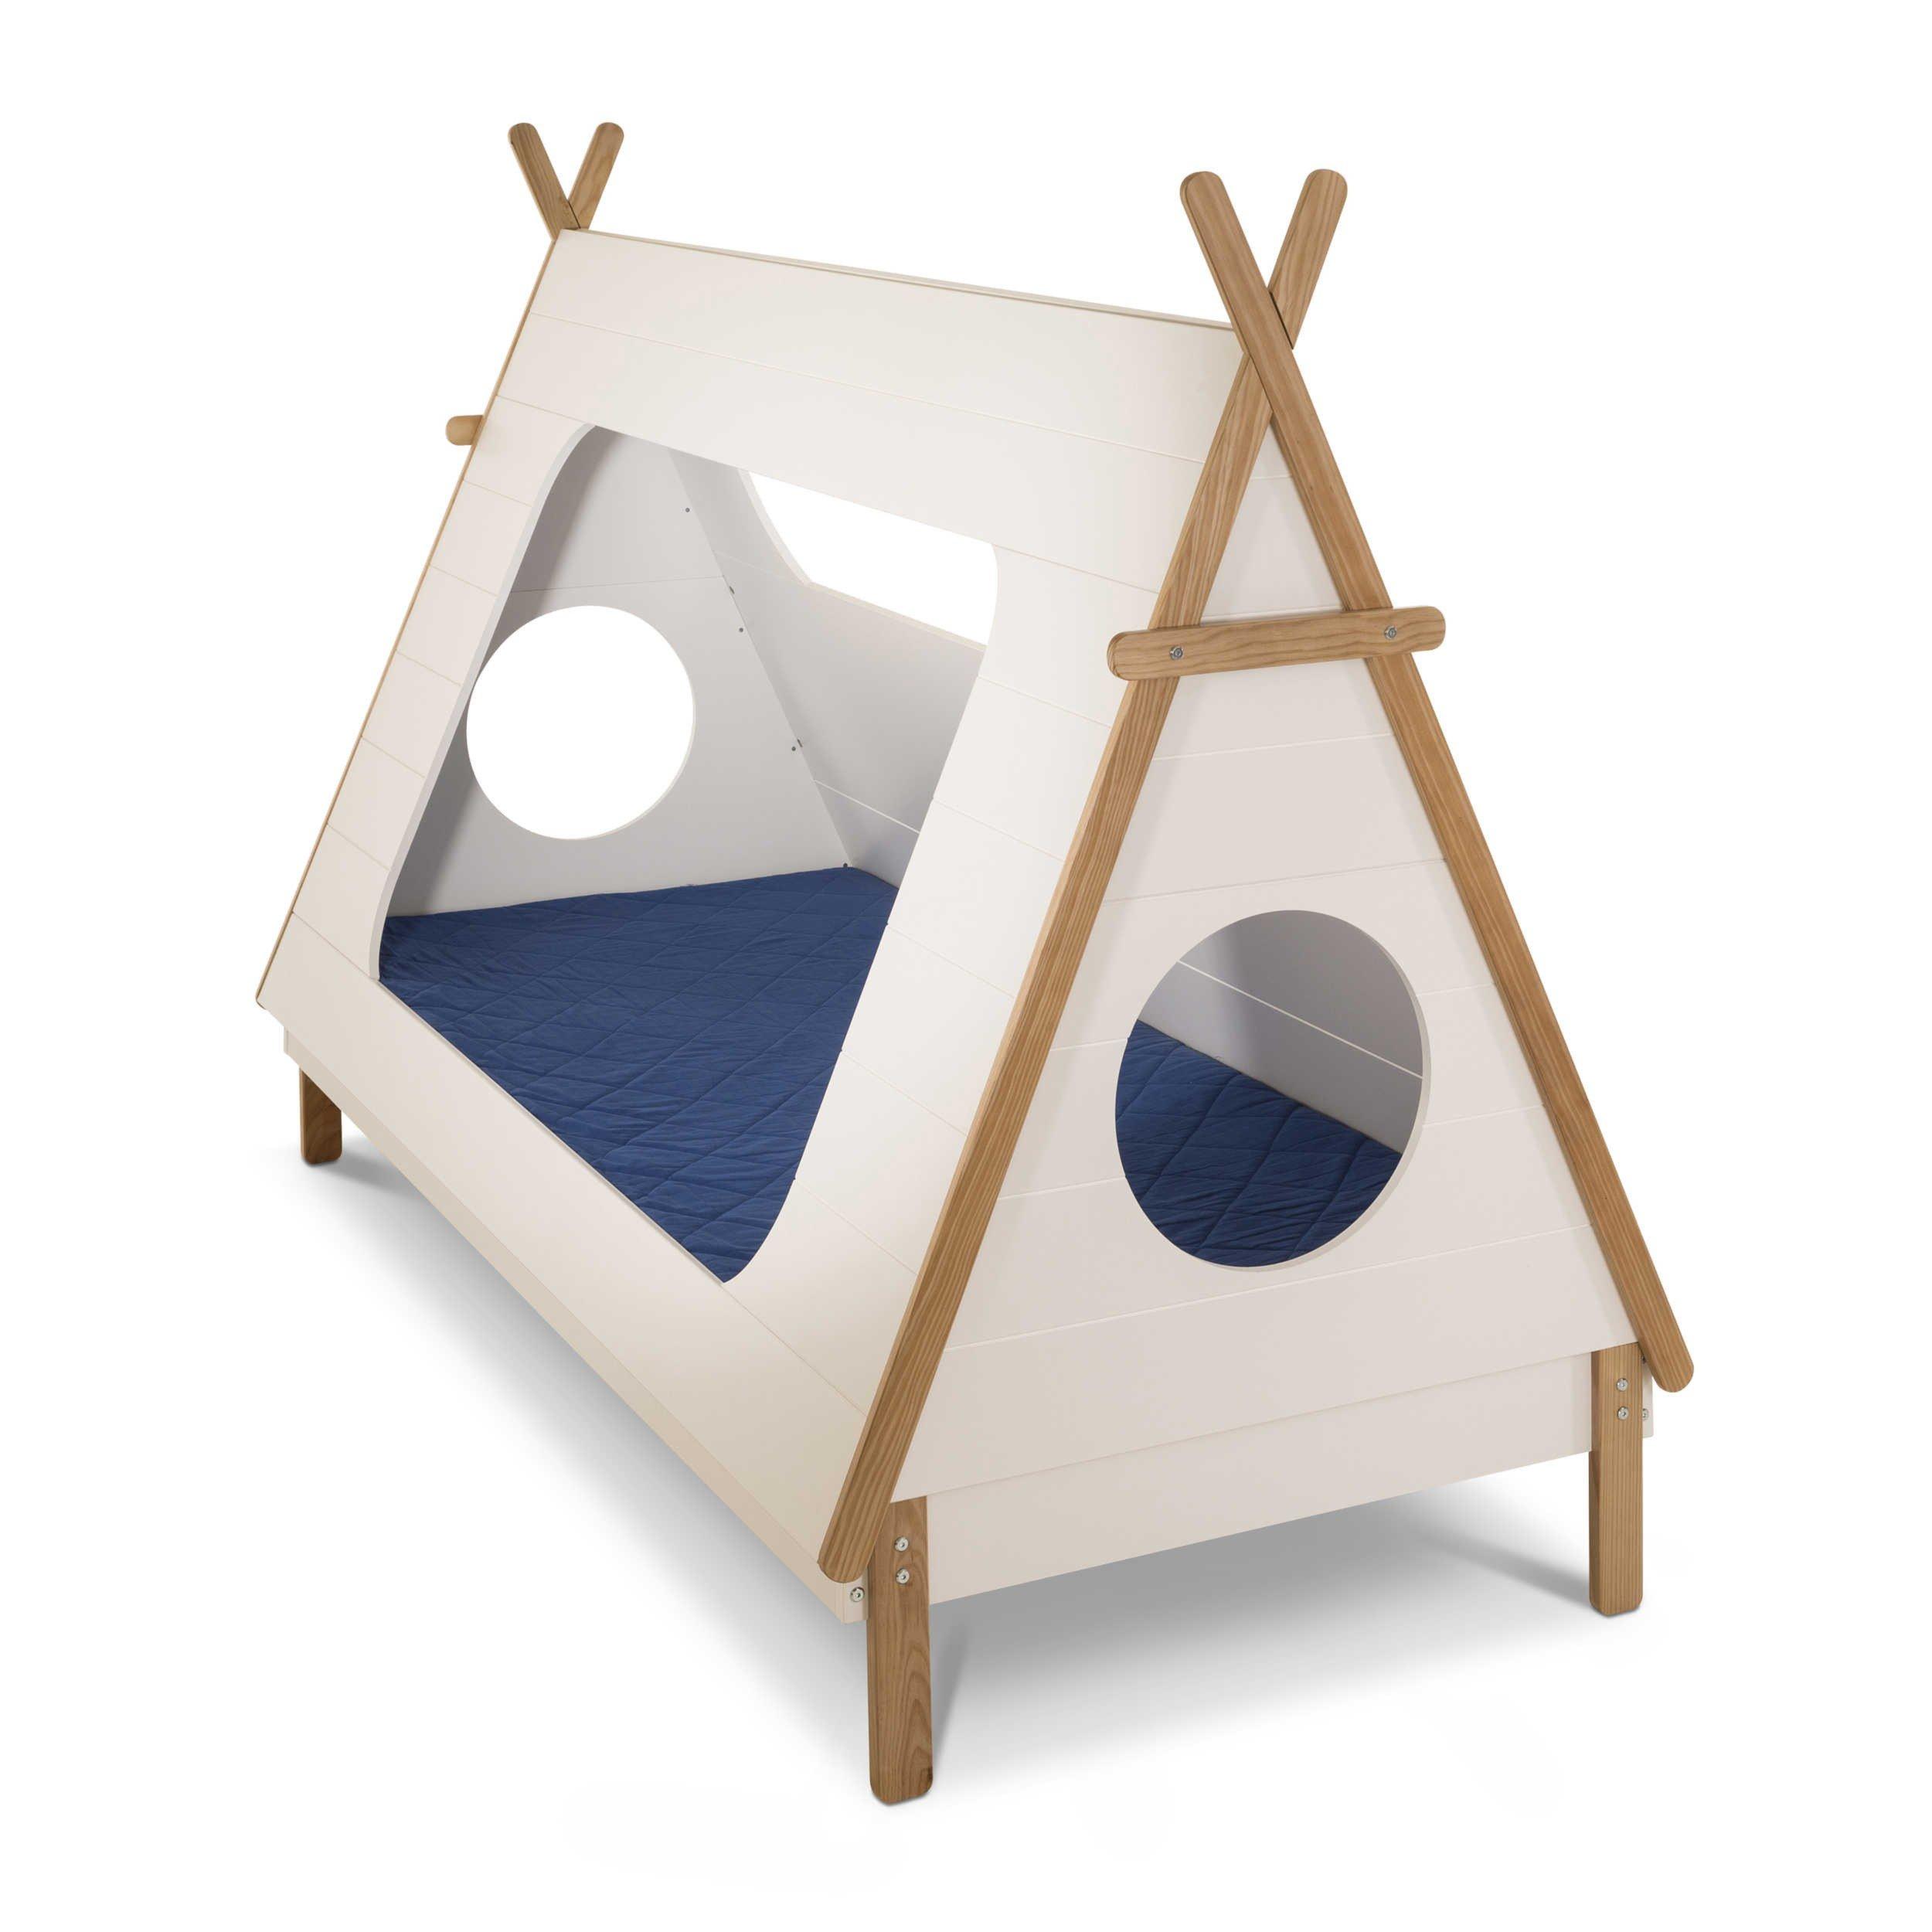 TIPI Kinder- und Jugendbett inkl. Versand 328,95€ / Abholung 299€ [SEGMÜLLER]